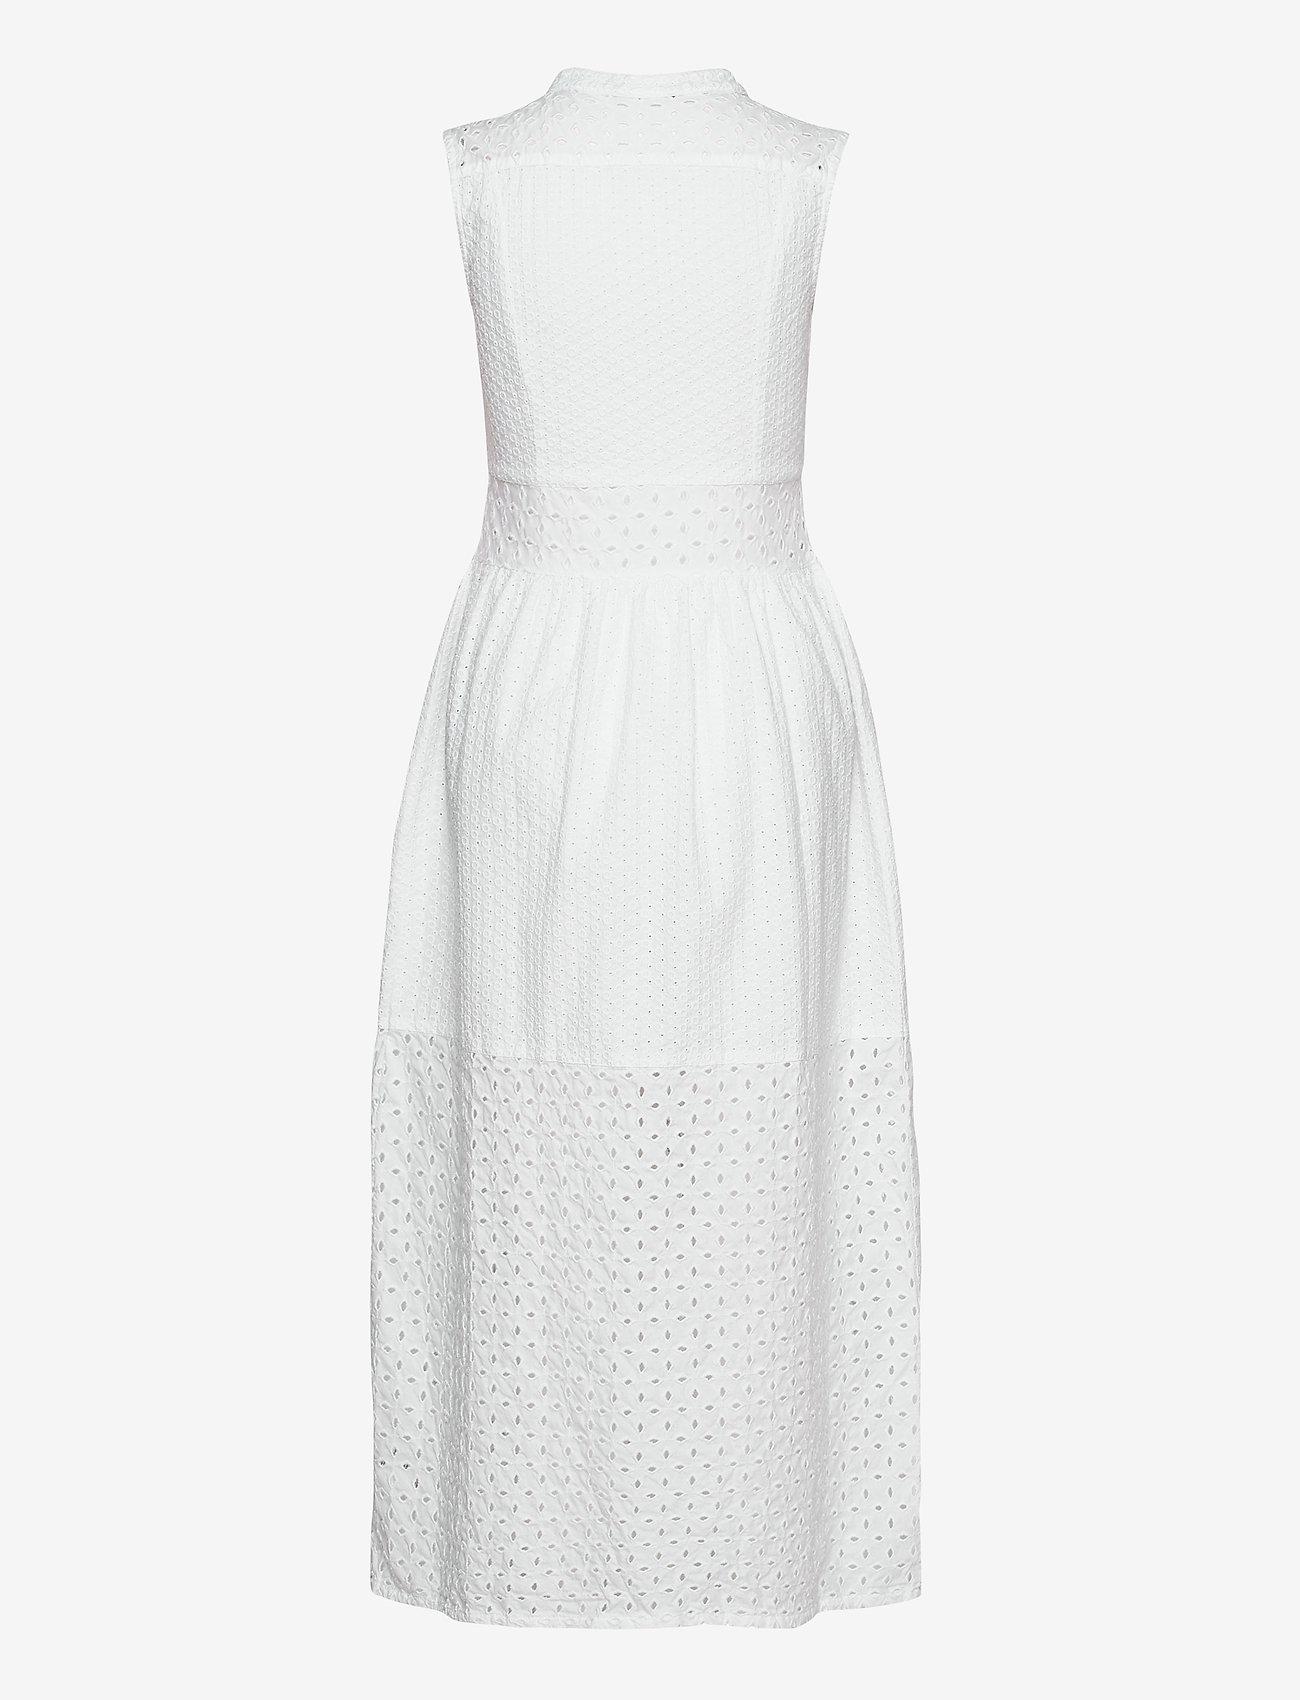 GANT - D1. BRODERIE ANGLAISE MAXI DRESS - midi dresses - white - 1